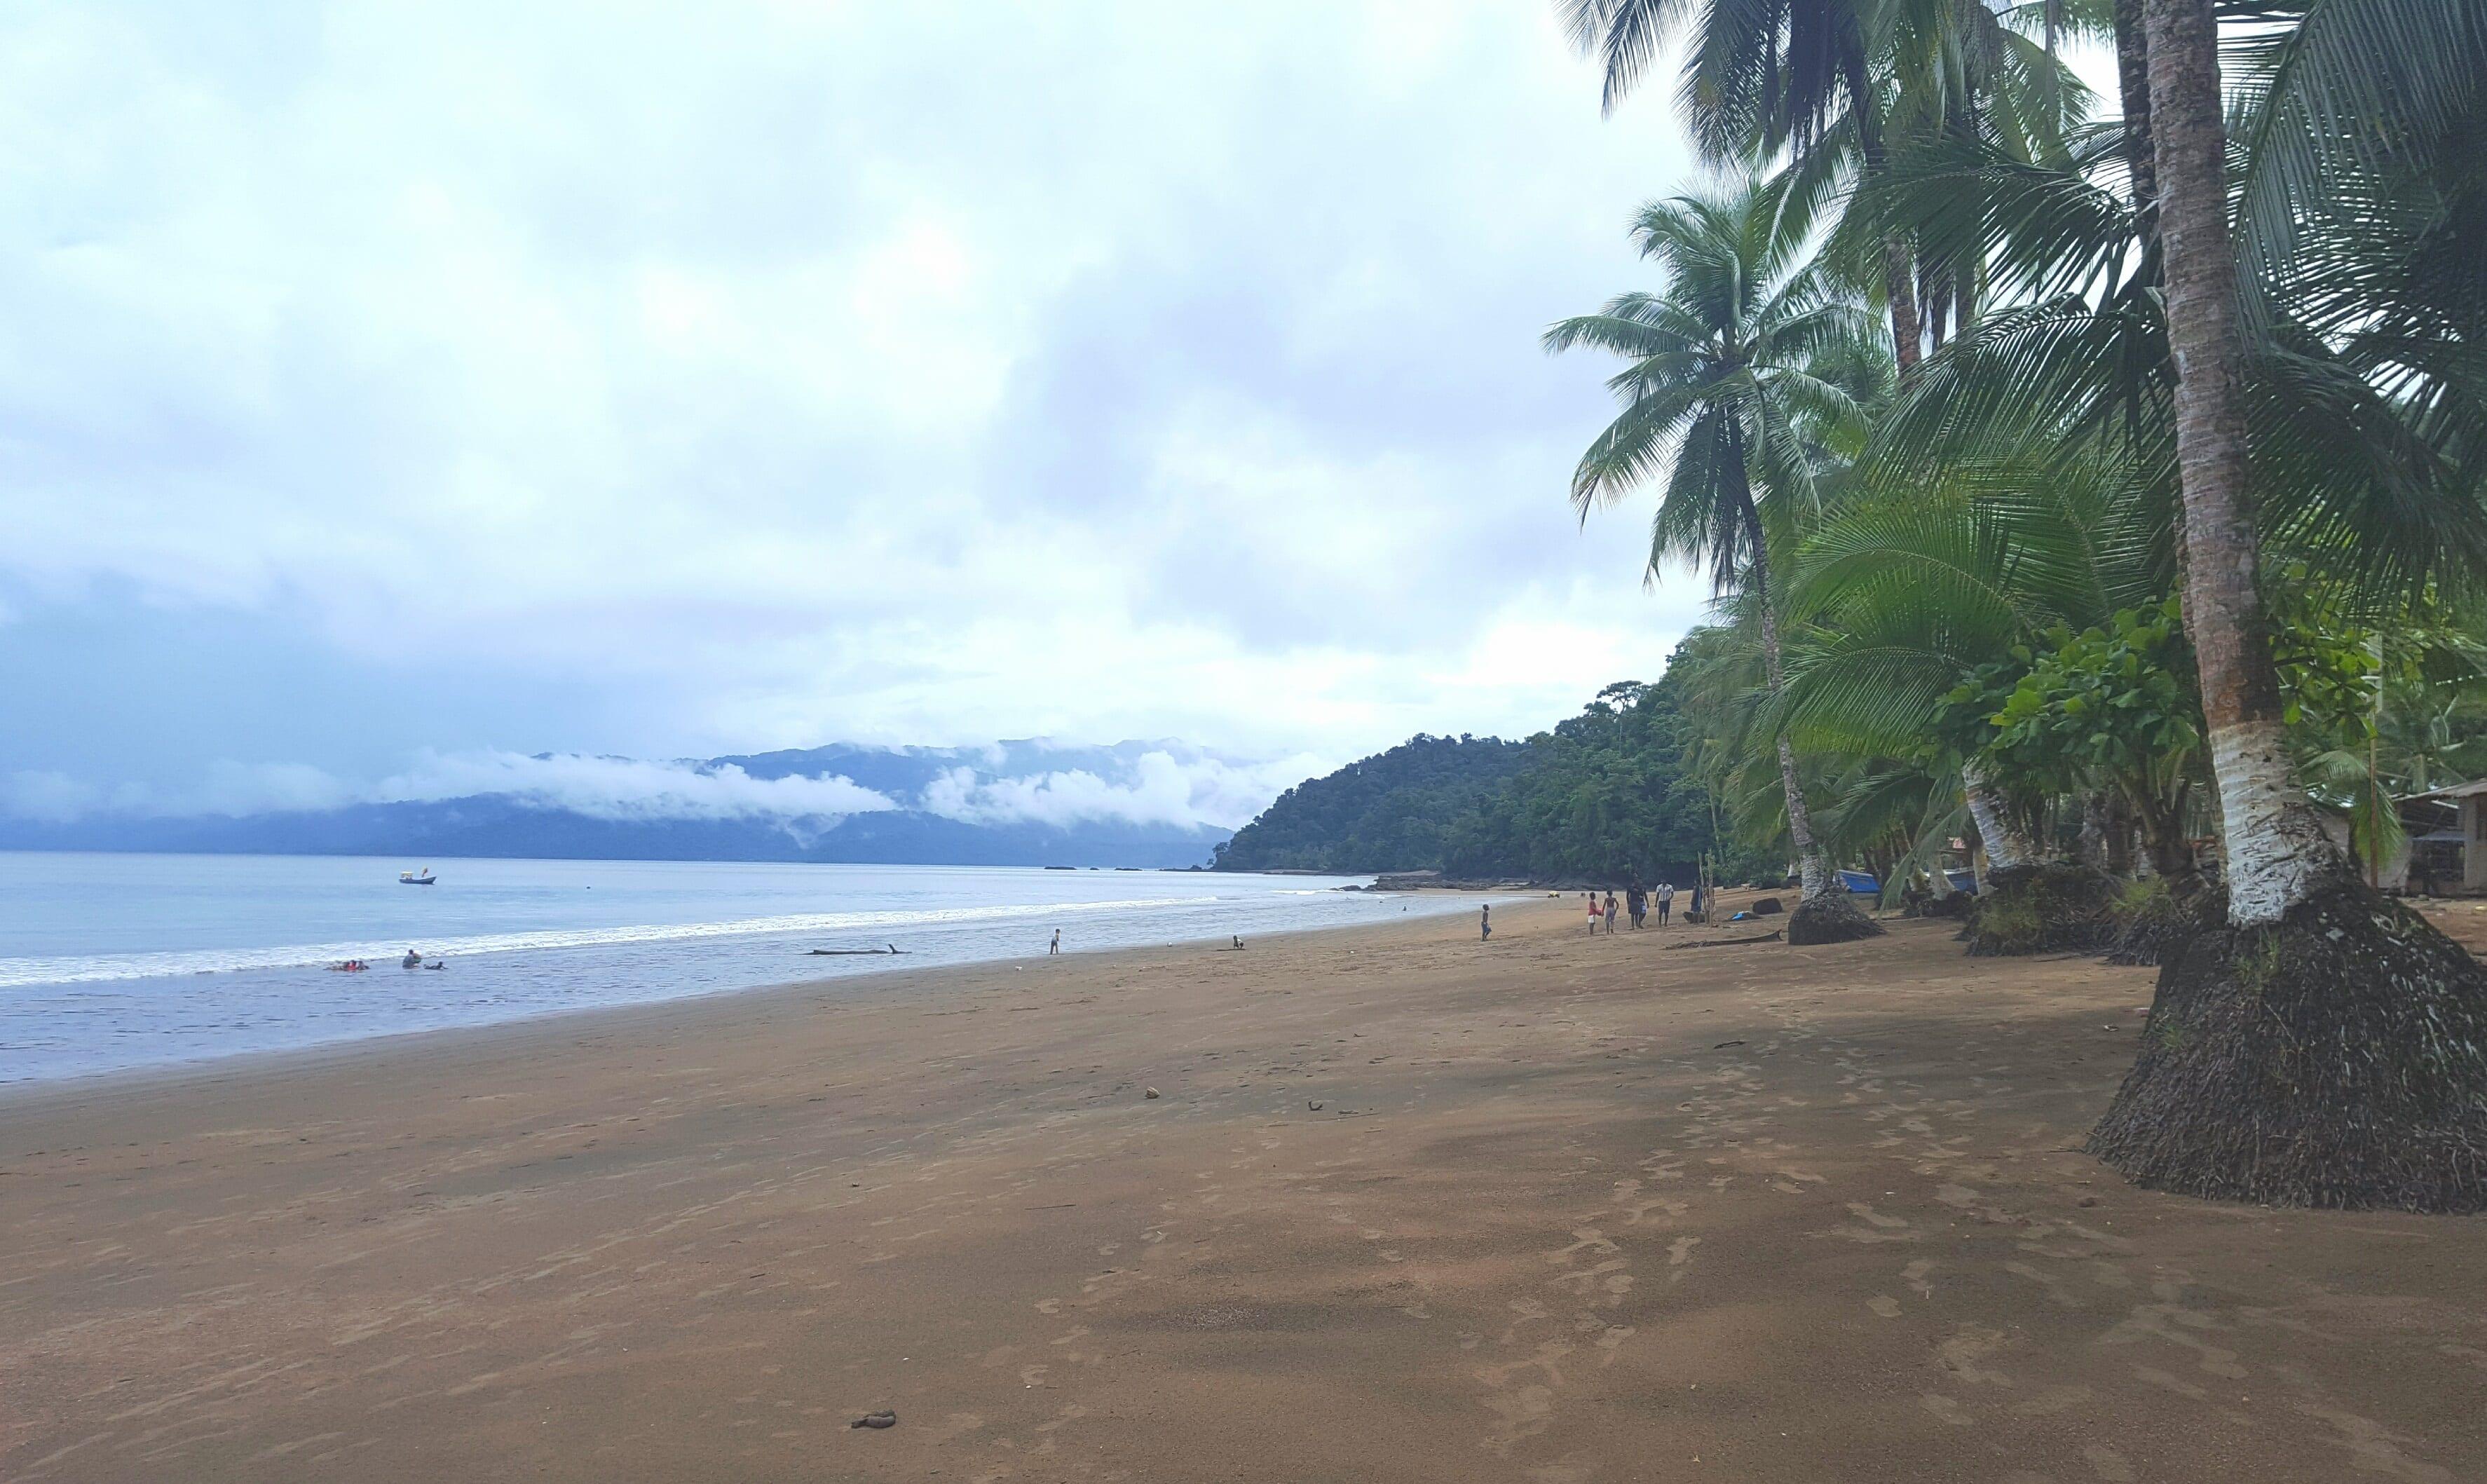 The community of Playa Potes, Chocó